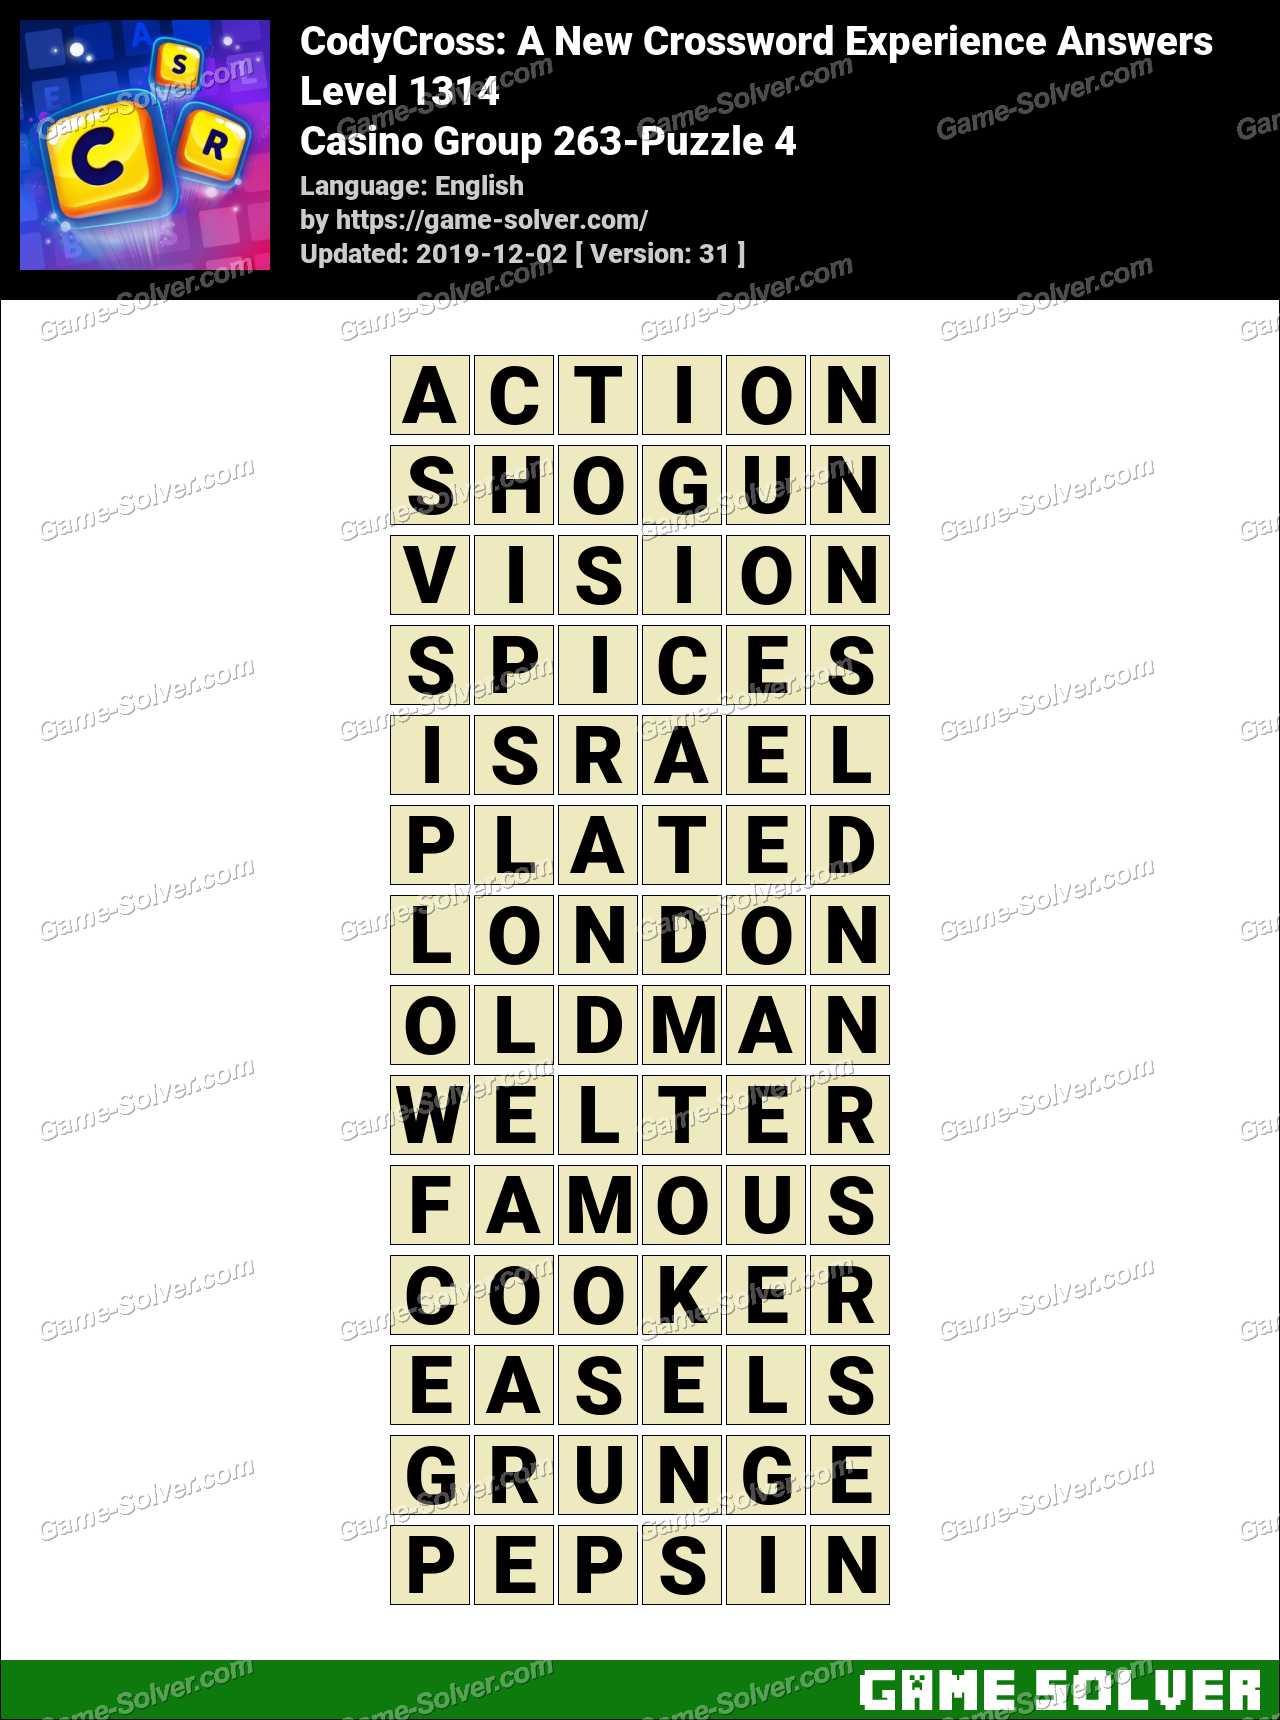 CodyCross Casino Group 263-Puzzle 4 Answers